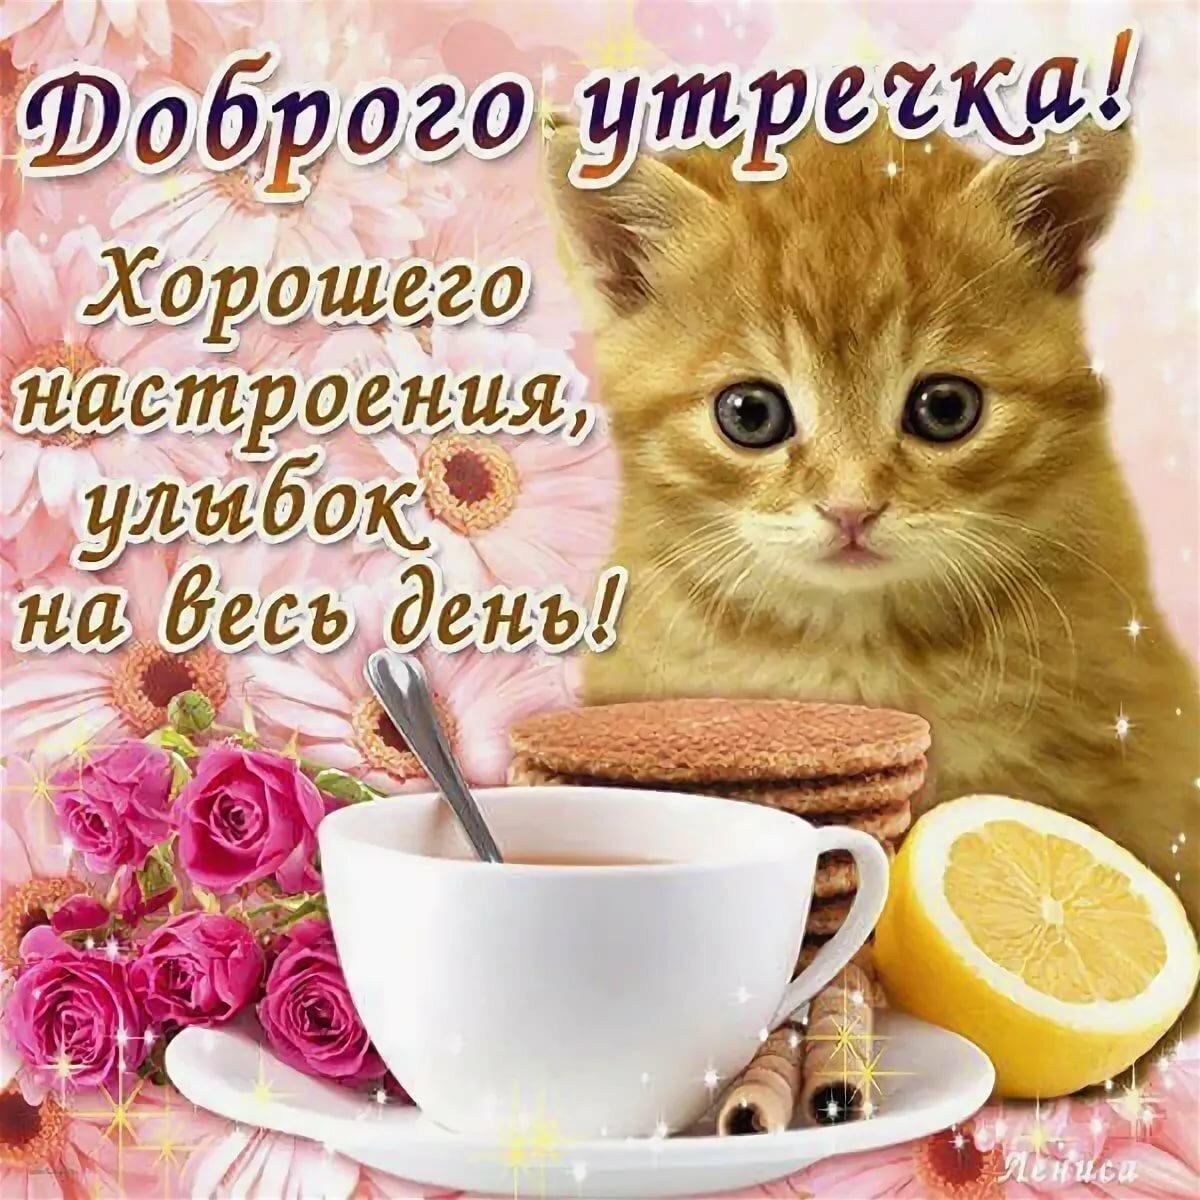 Утра доброго дня прекрасного веселые картинки